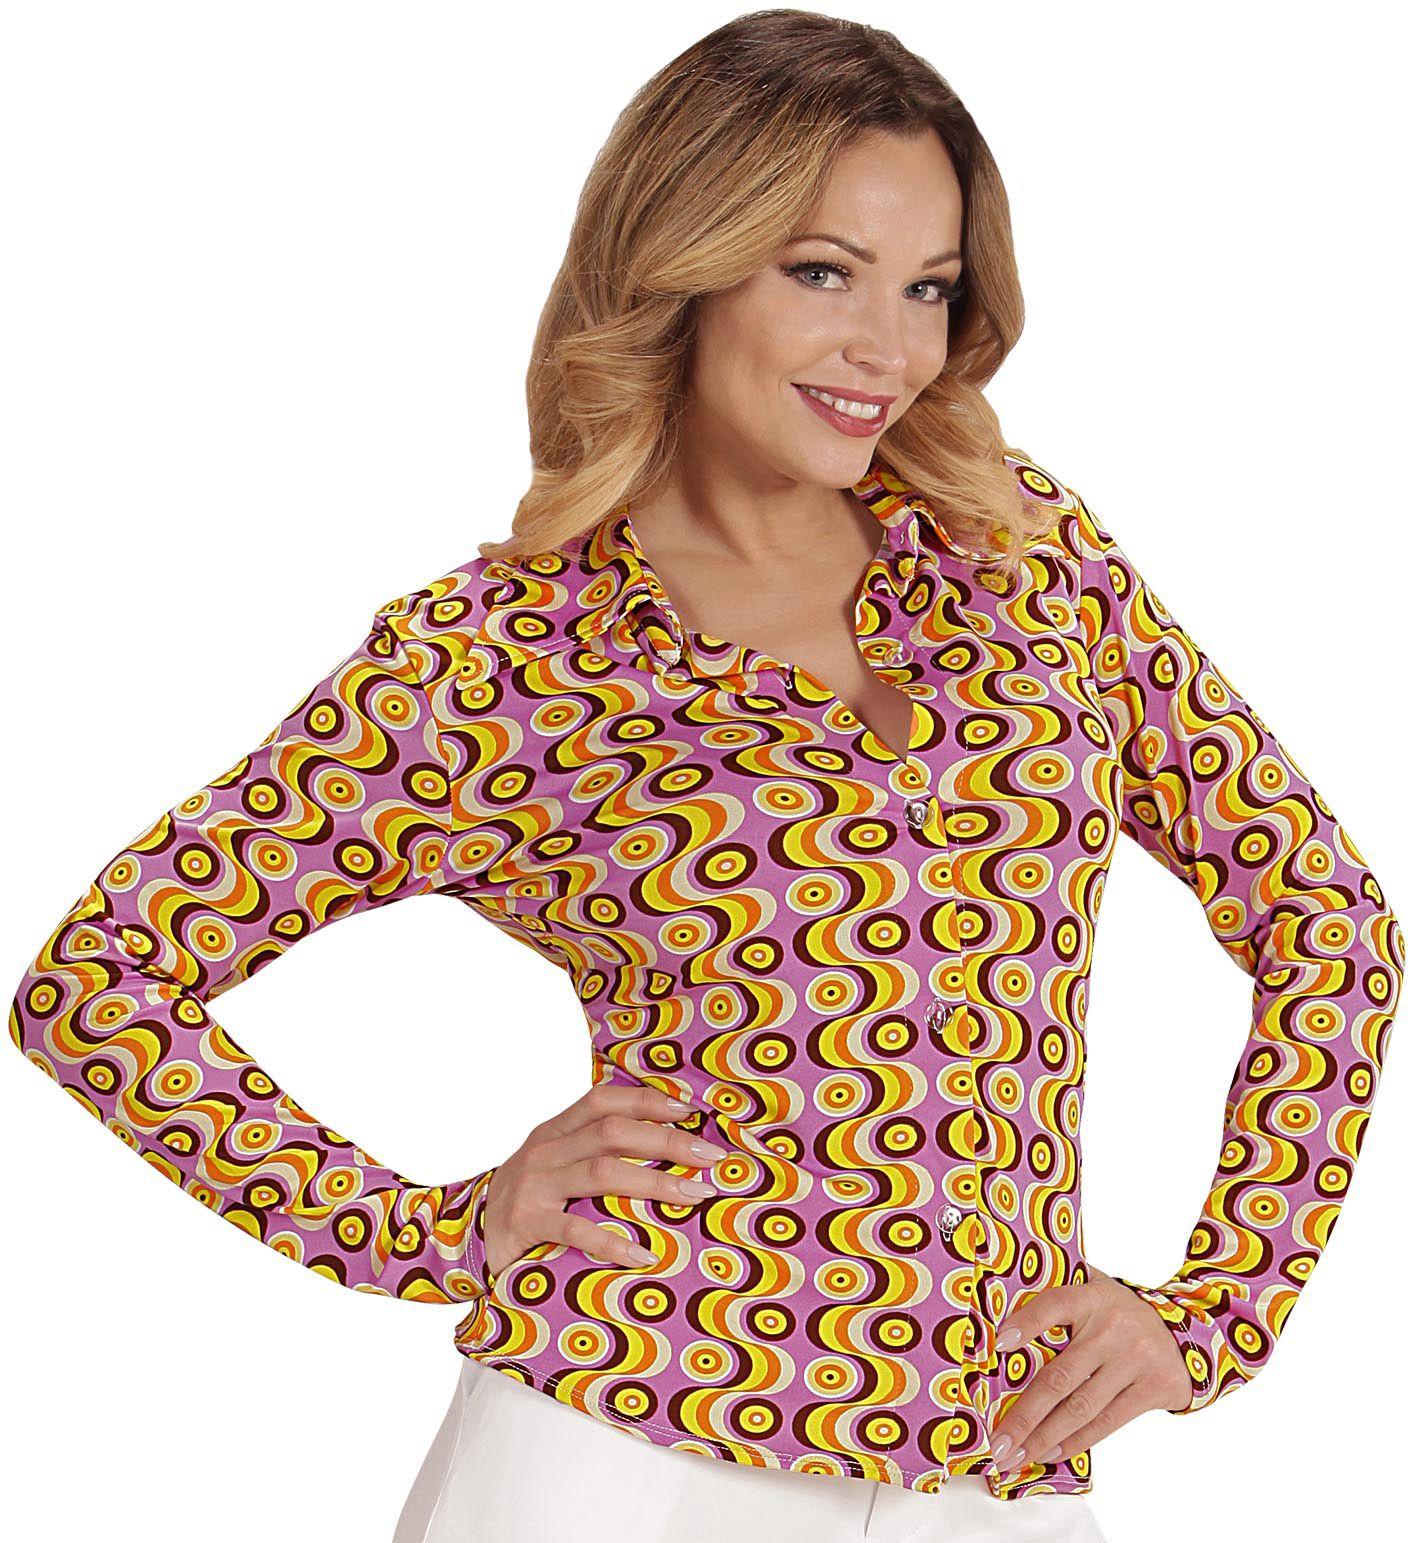 Groovy 70s dames shirt